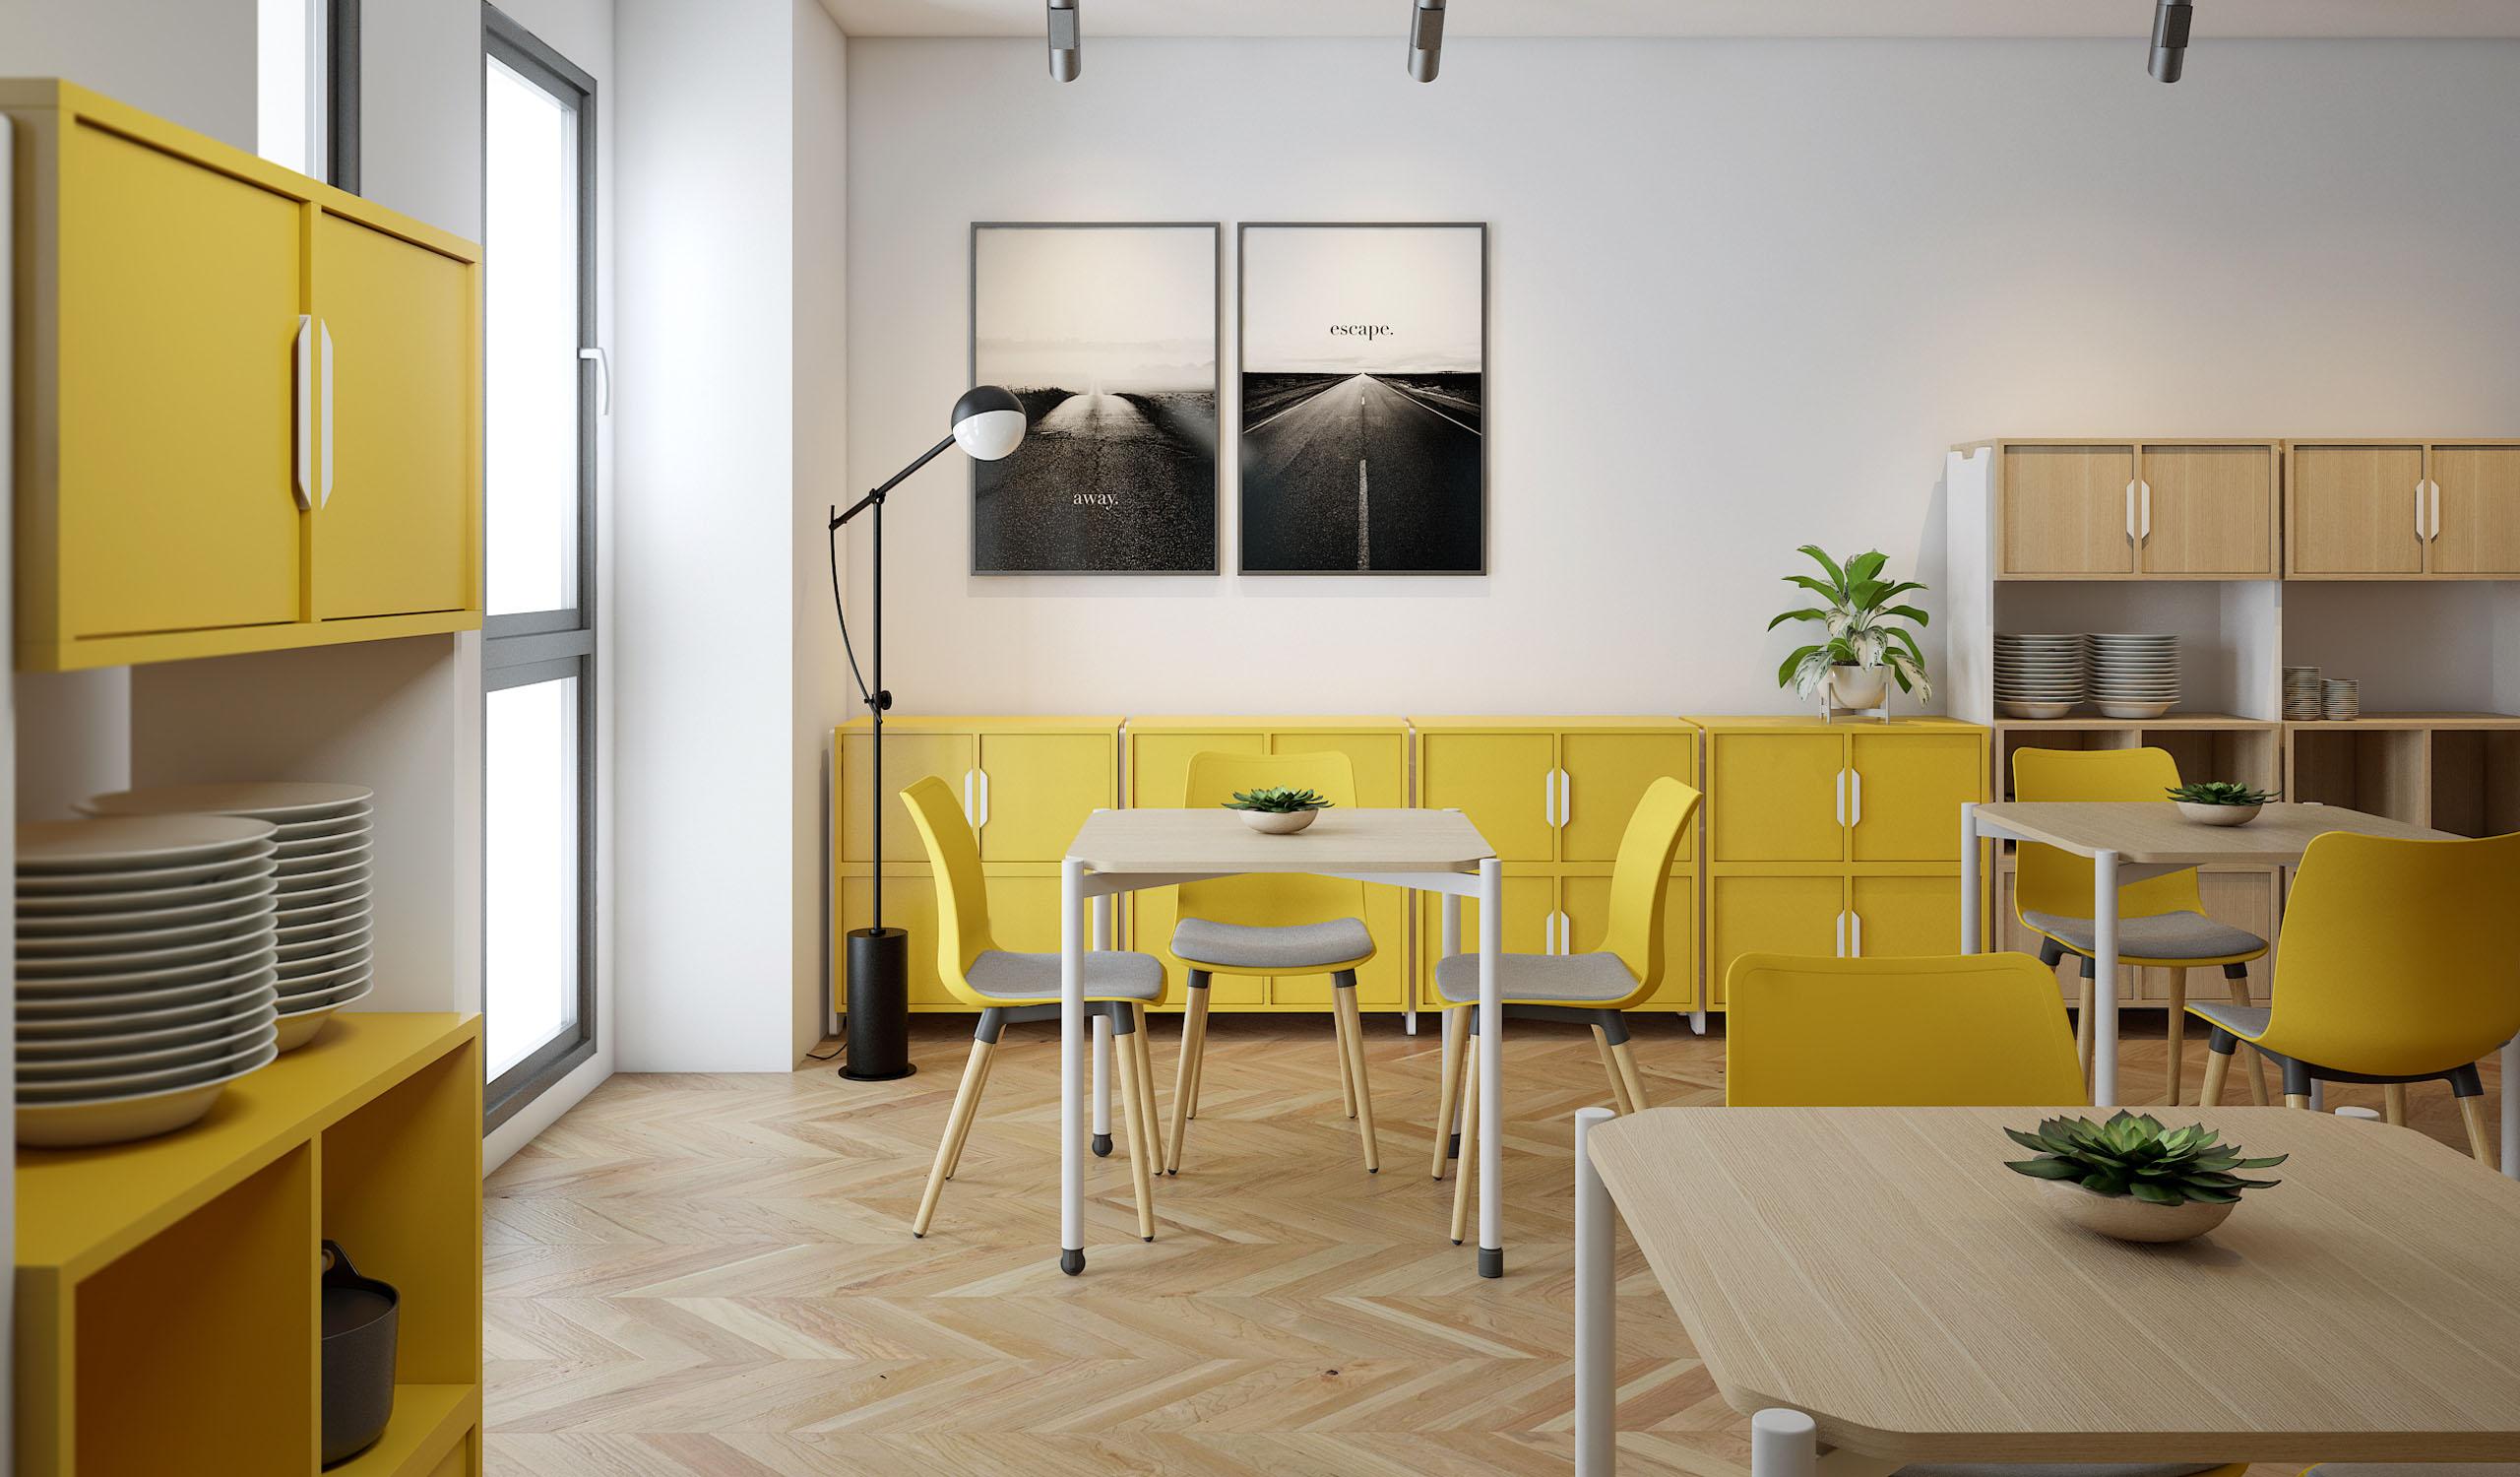 Vintiquatre Colección Tóteem Grupp Ulkia contract oreca almacenaje producto mobiliario diseño